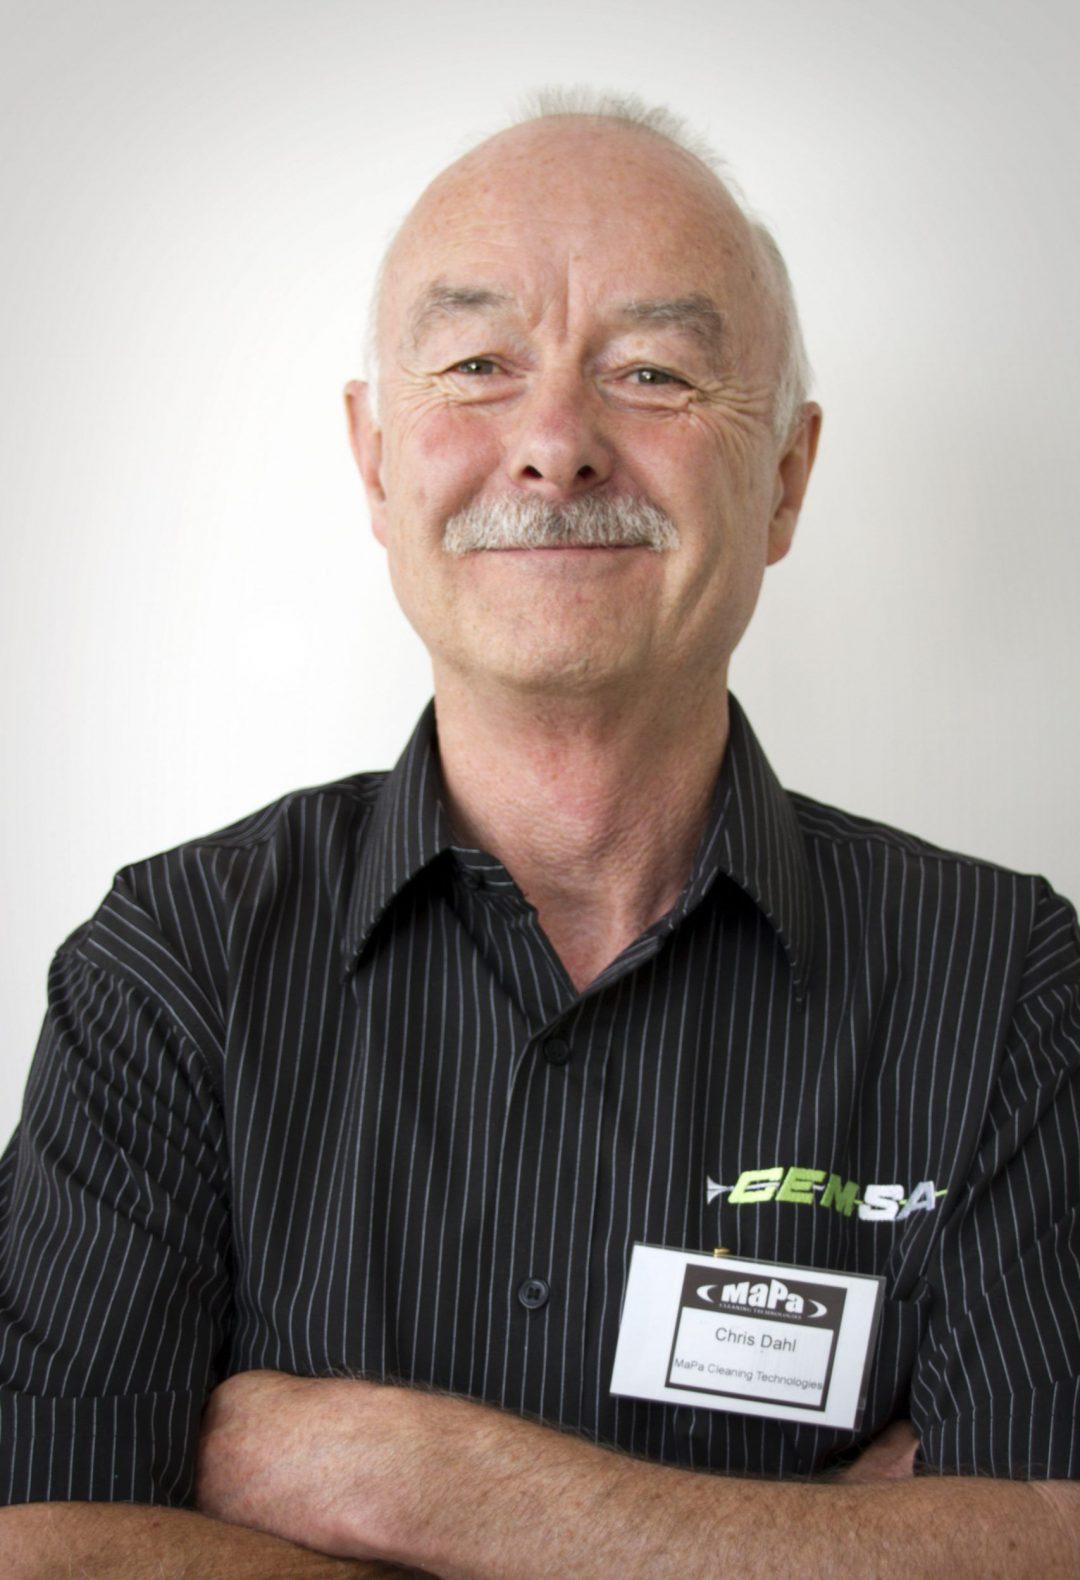 Chris Dahl CEMSA Director South Africa